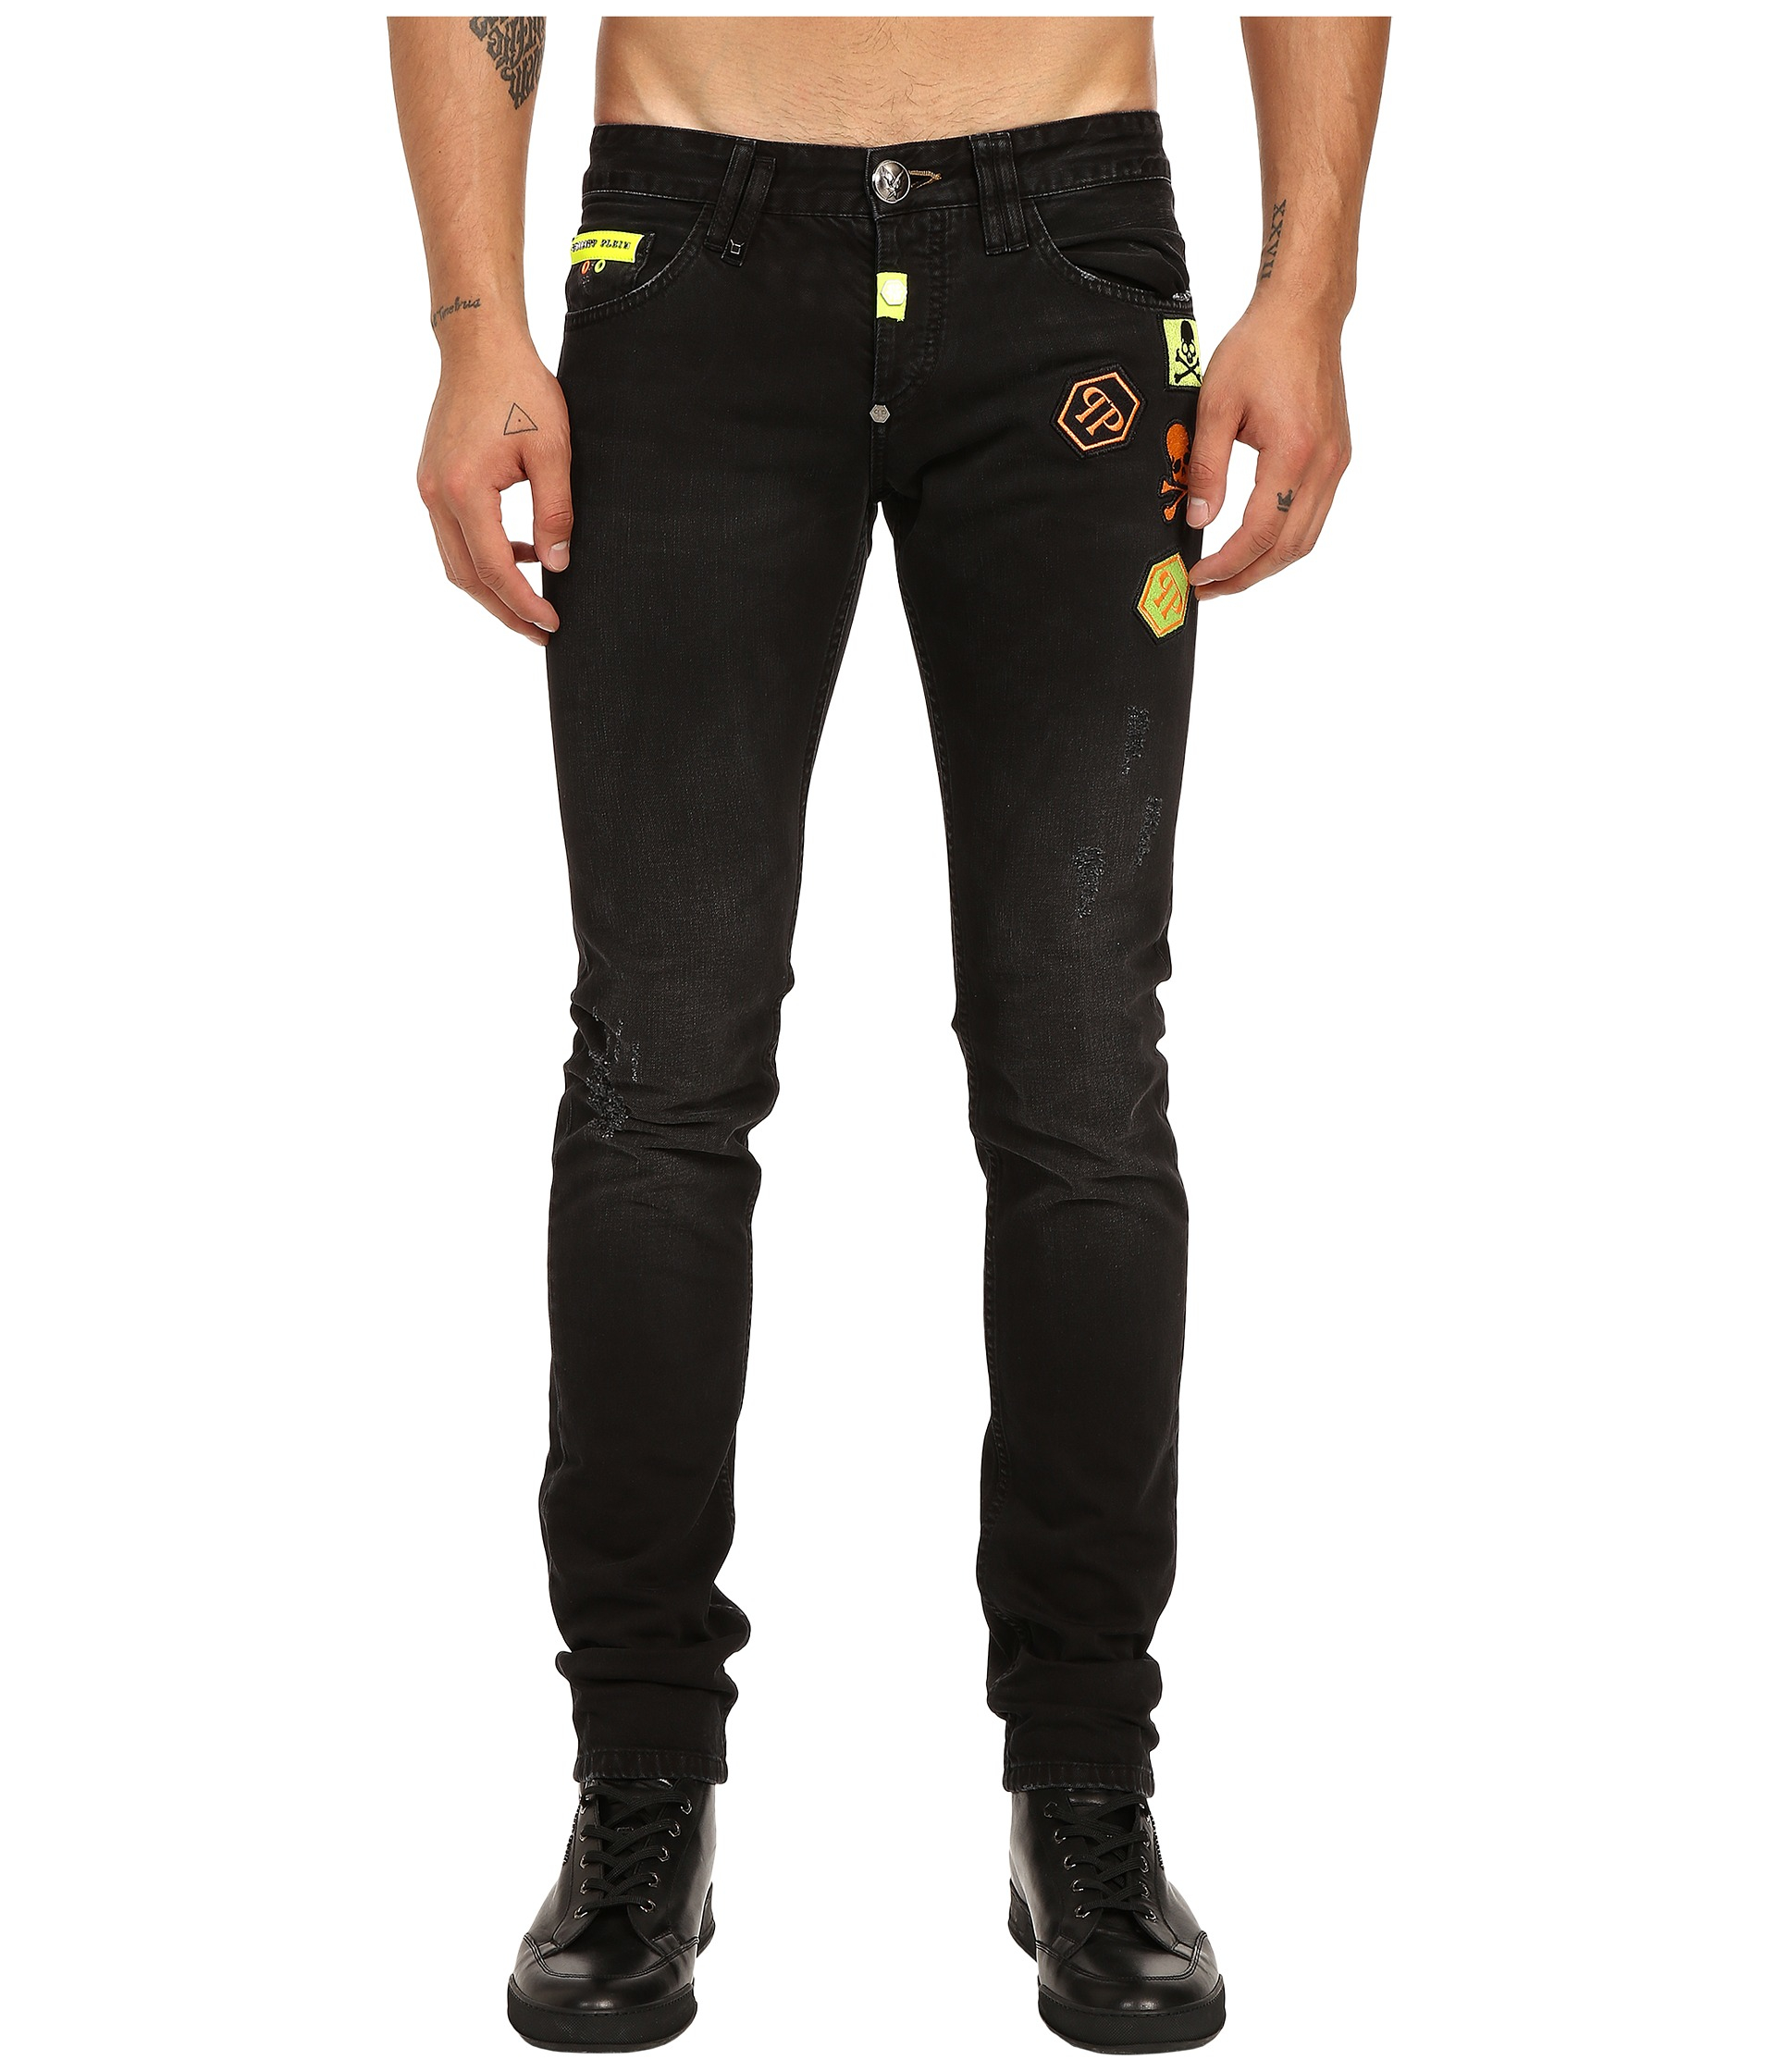 lyst philipp plein slim fit jeans in black for men. Black Bedroom Furniture Sets. Home Design Ideas